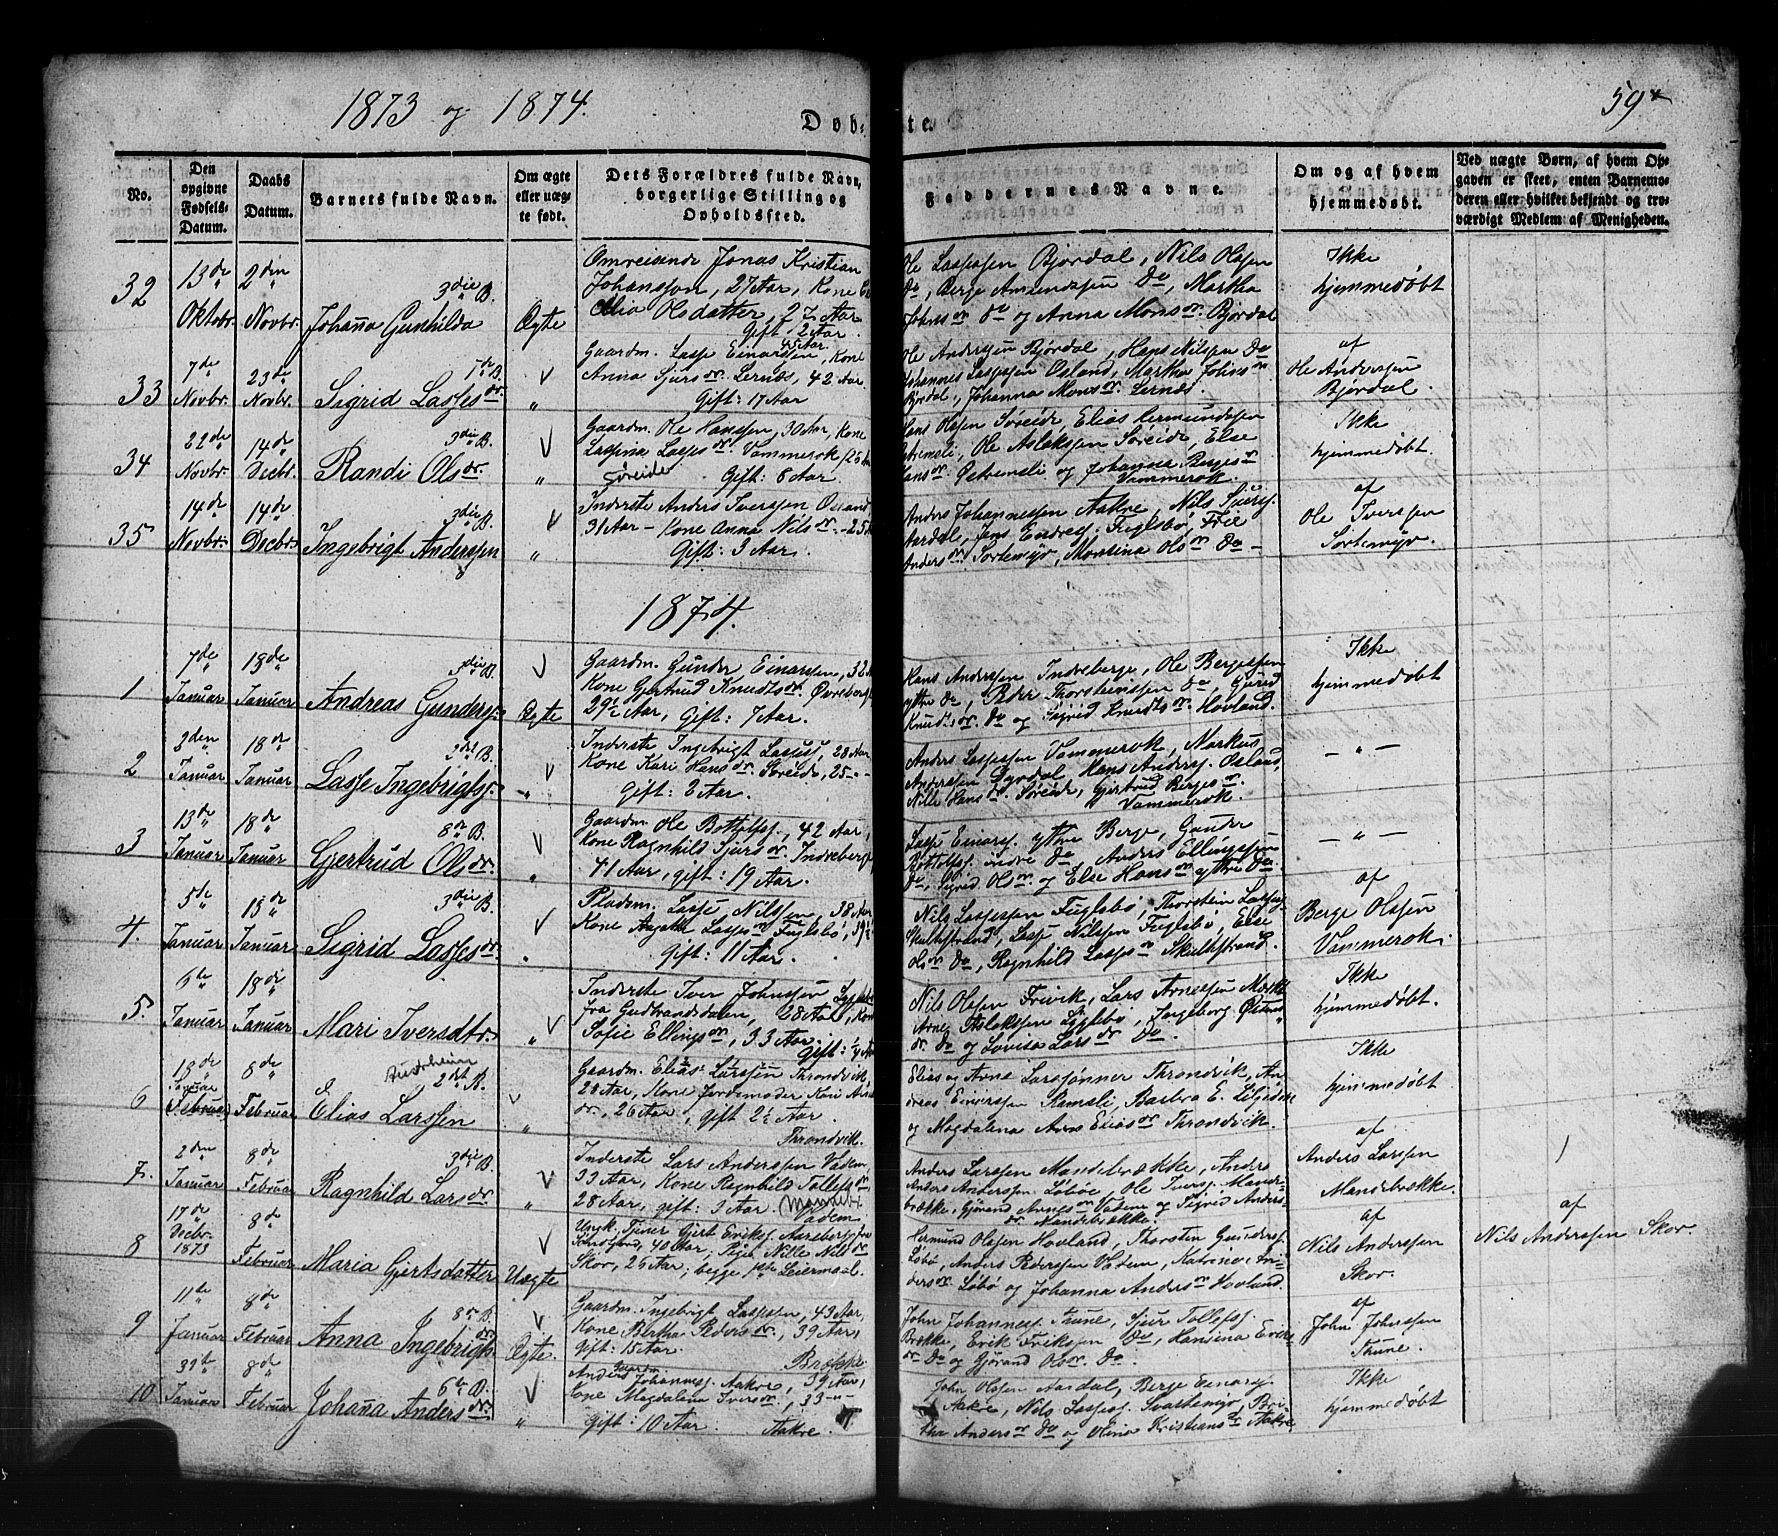 SAB, Lavik Sokneprestembete, Klokkerbok nr. B 1, 1854-1881, s. 59